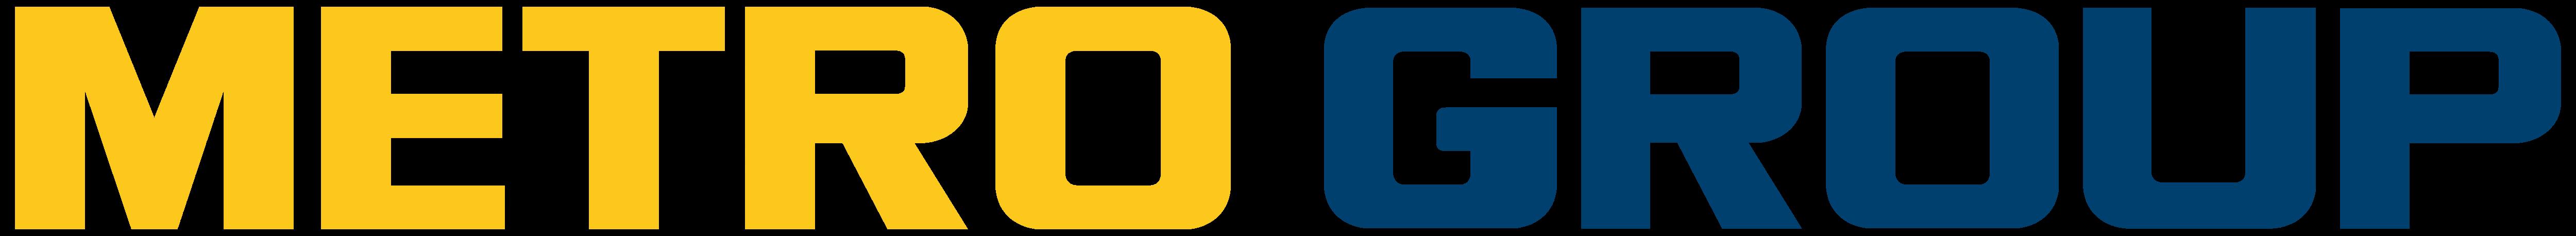 Metro_Group_logo_wordmark